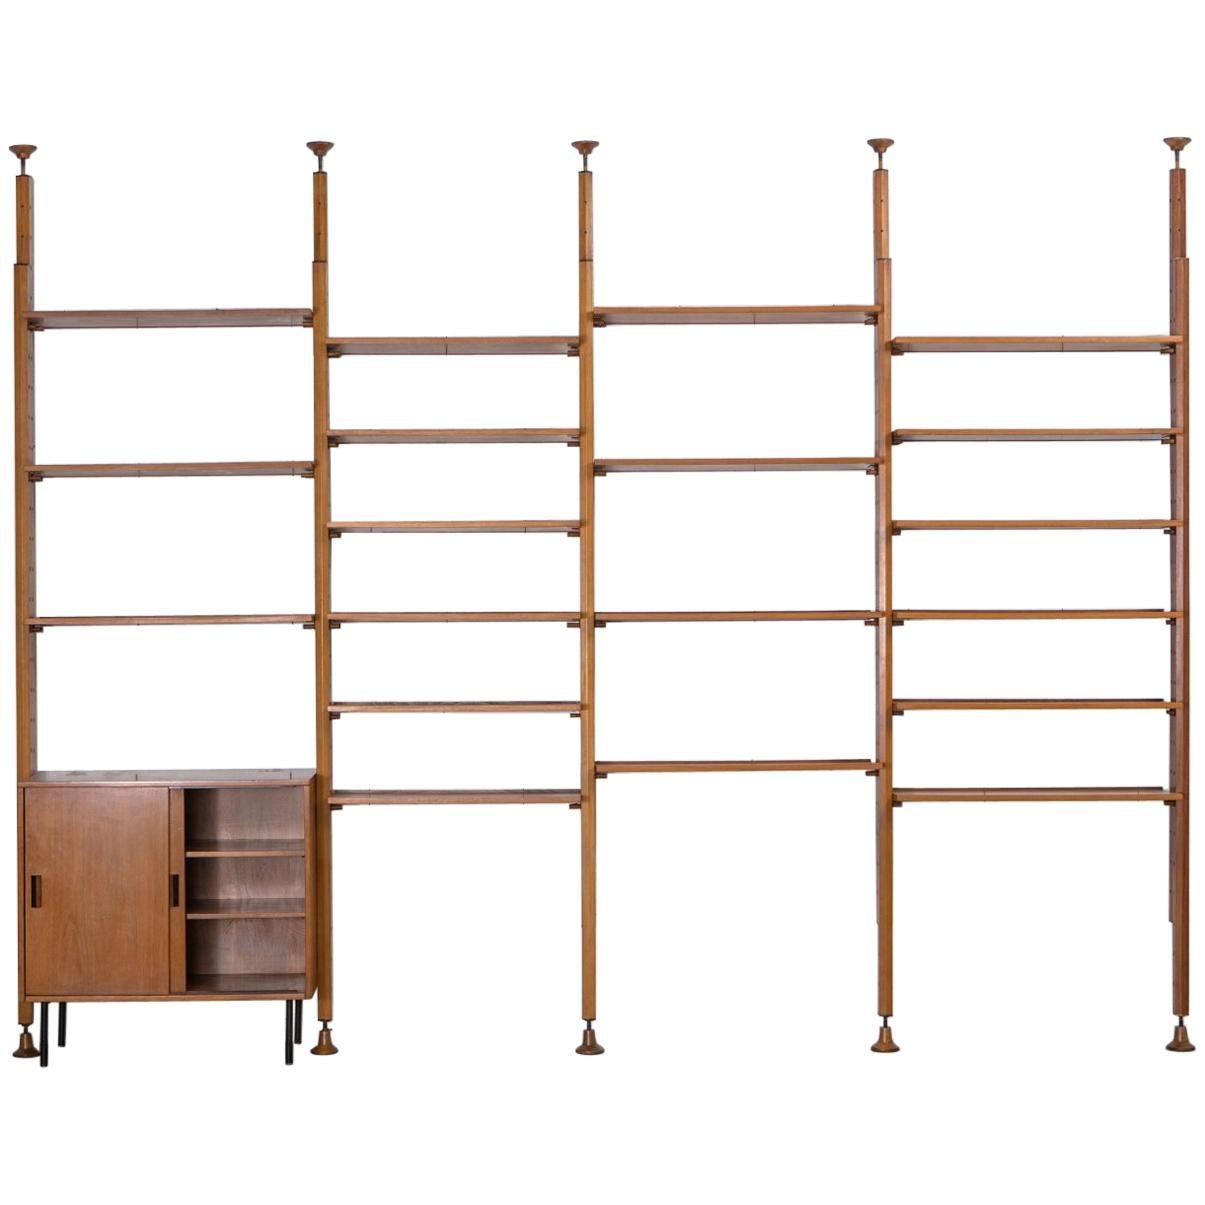 Wall Unit / Shelf System by Leonardo Fiori for I.S.A. Bergamo, Italy, 1950s